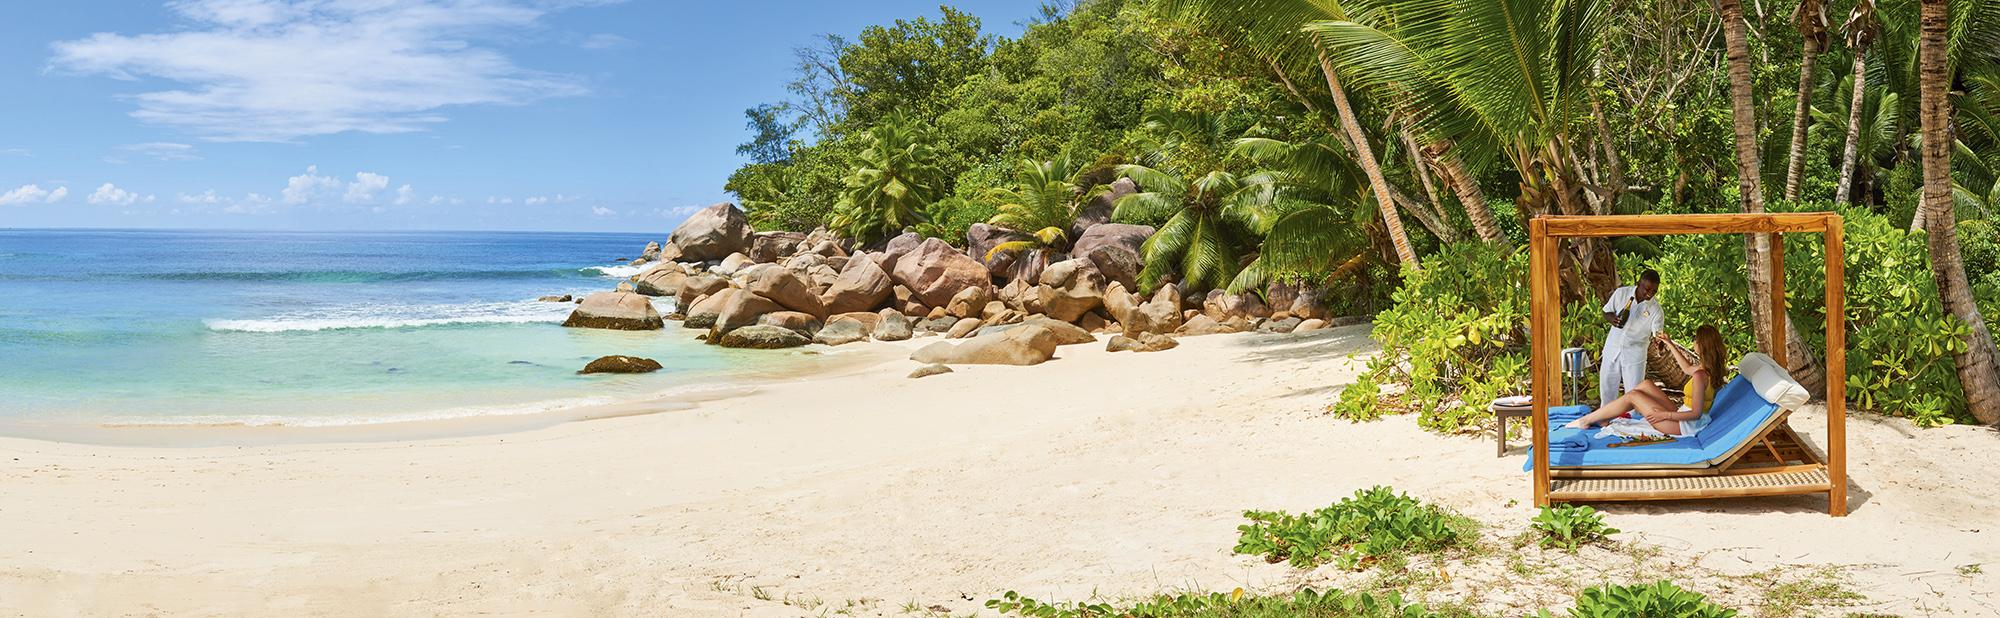 ! lemuria-seychelles-2016-AB-Cabana-Panorama-02